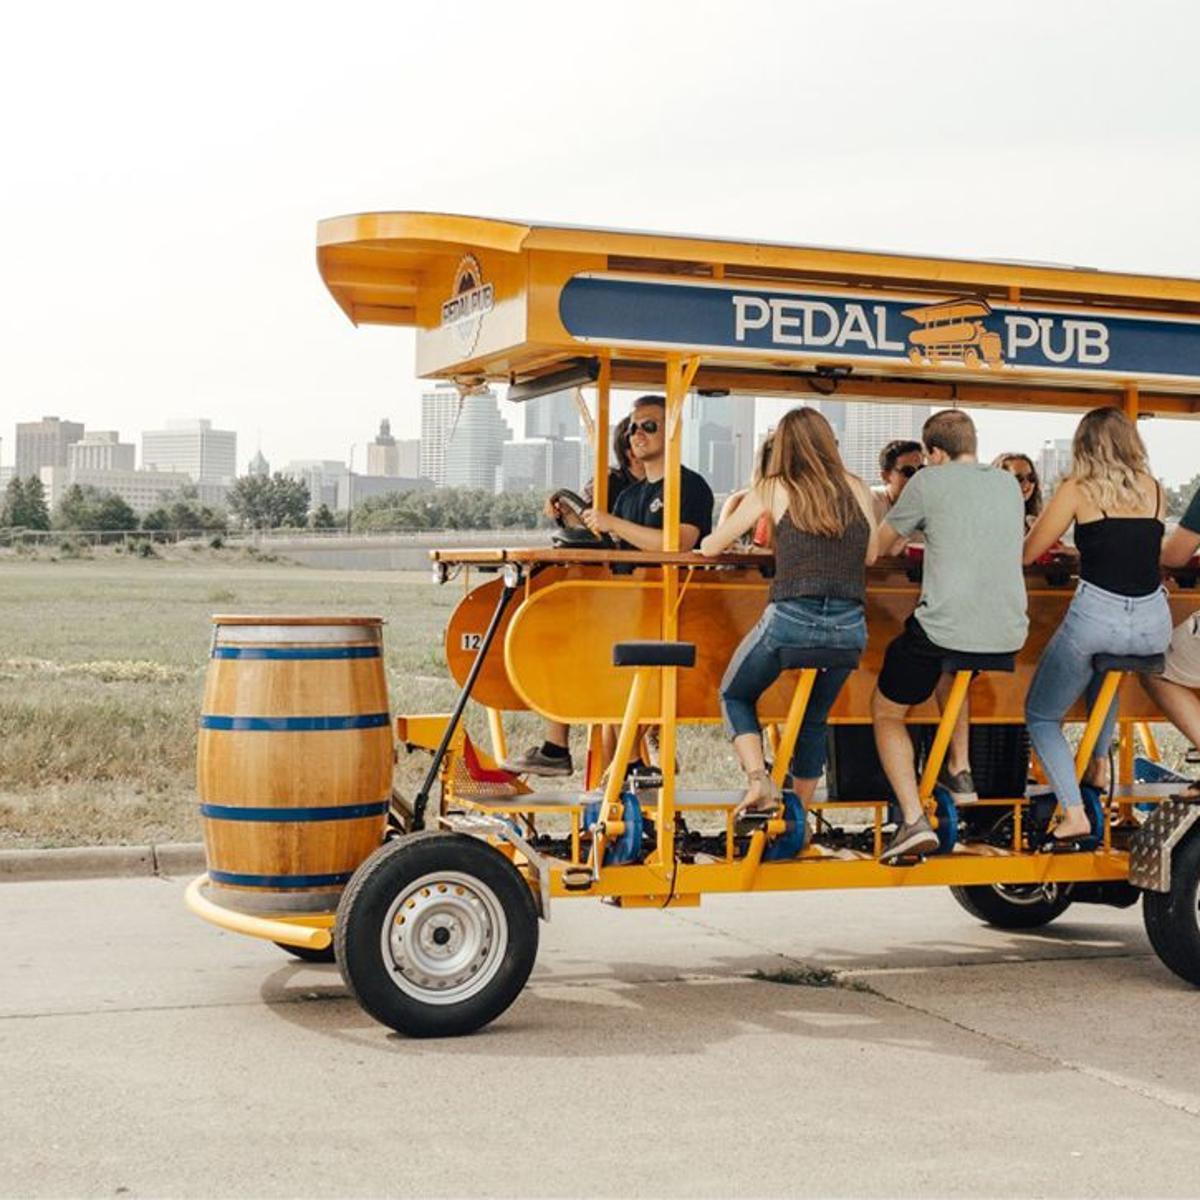 Pedal Pub is wheeling toward Quad-Cities  The 16-passenger